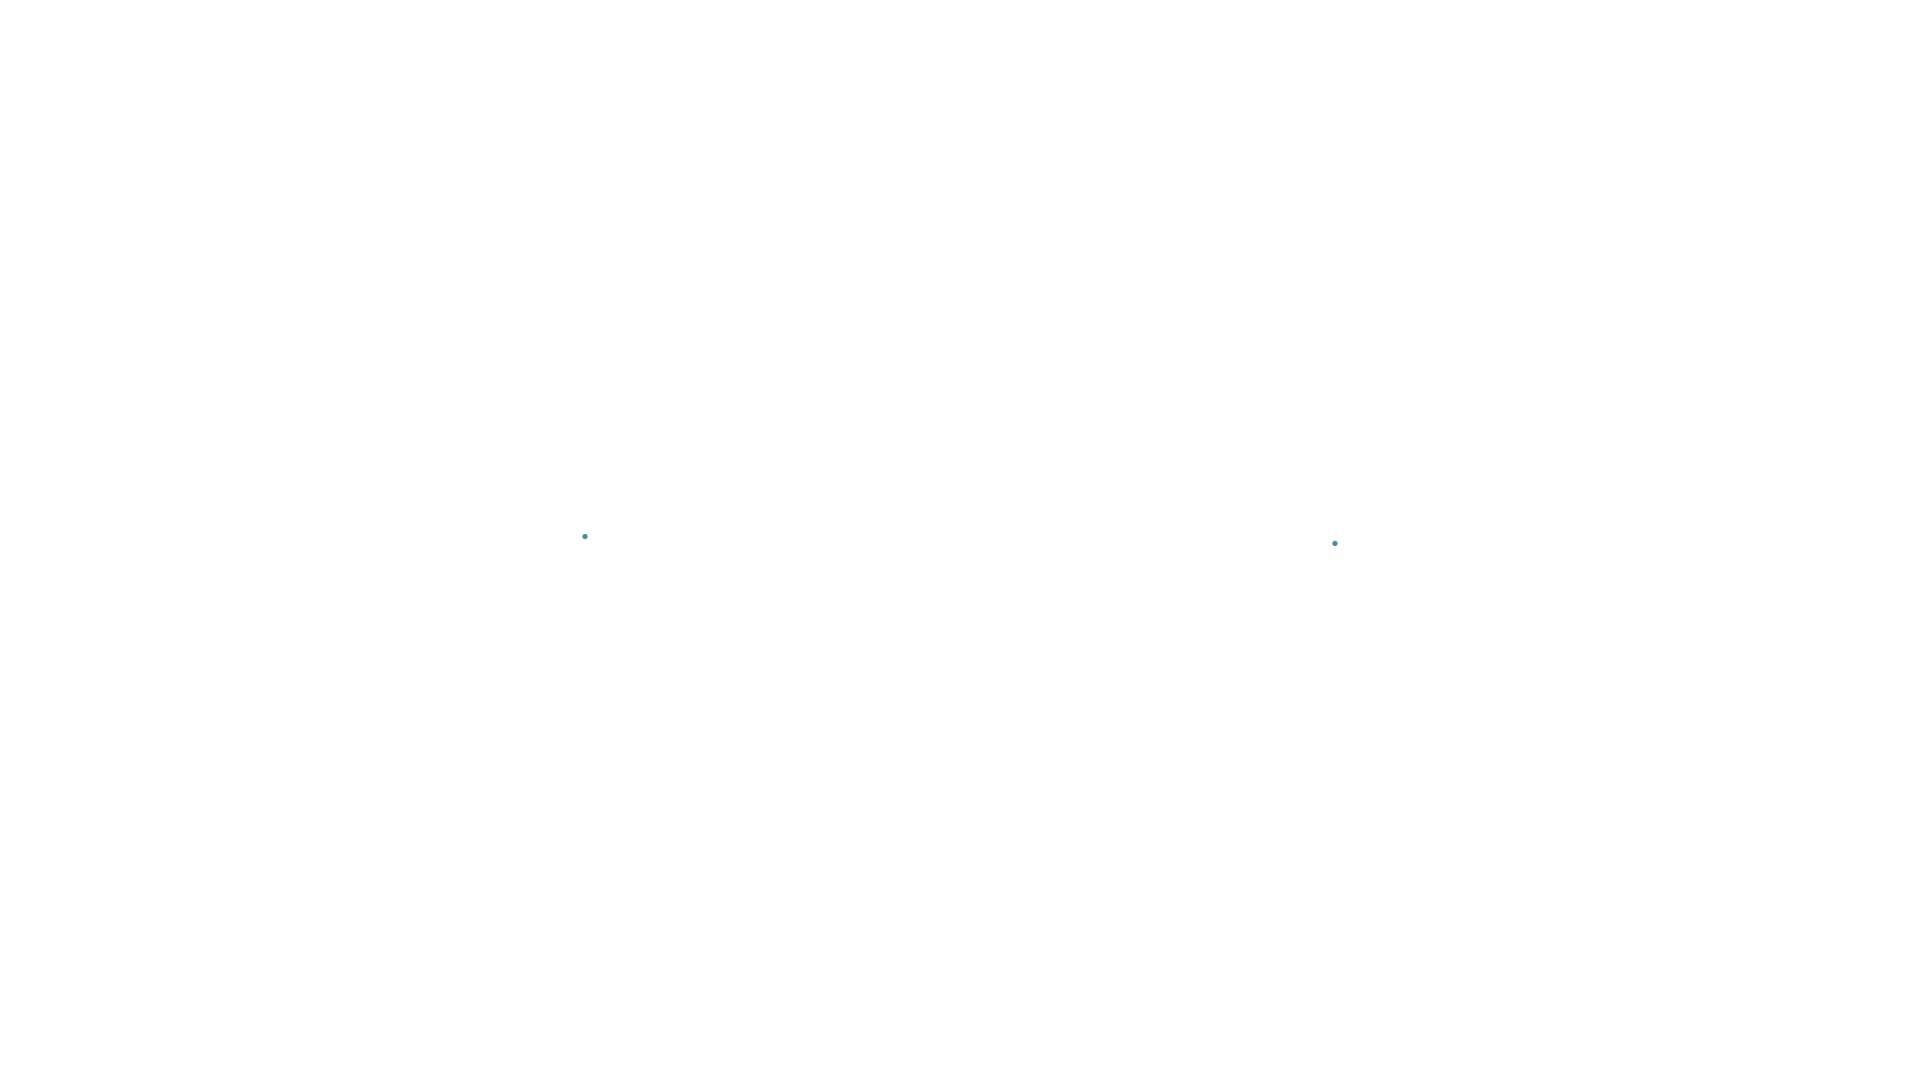 Goedkope Hoge Kwaliteit Emaille Sleutelhouder Aangepaste Metalen Sleutelhanger